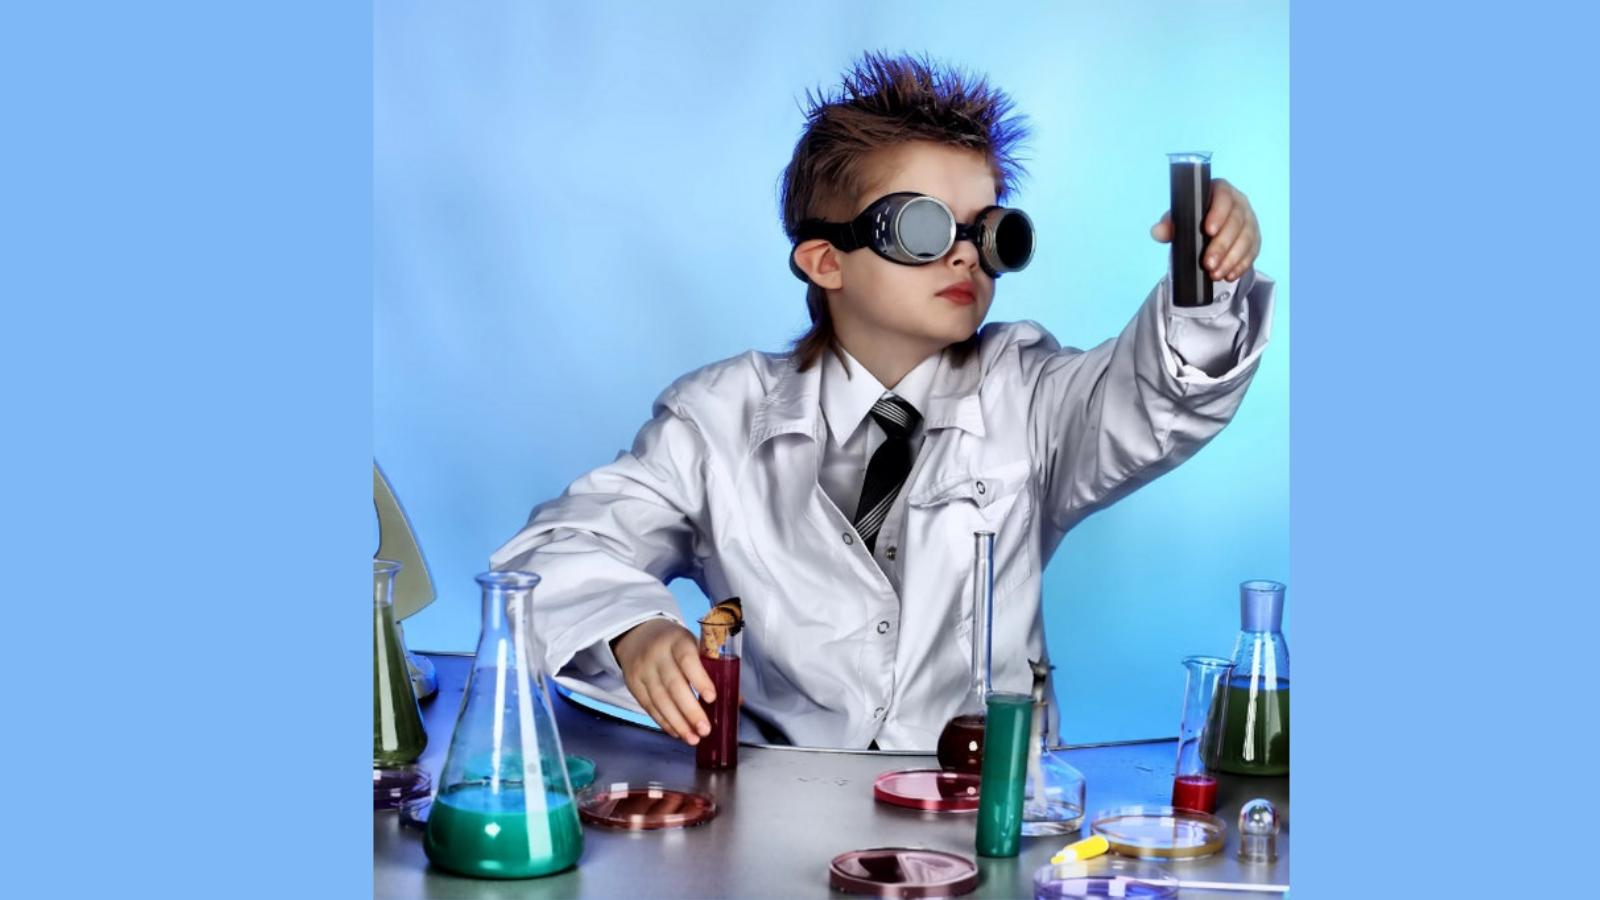 BITC ScienceStarz